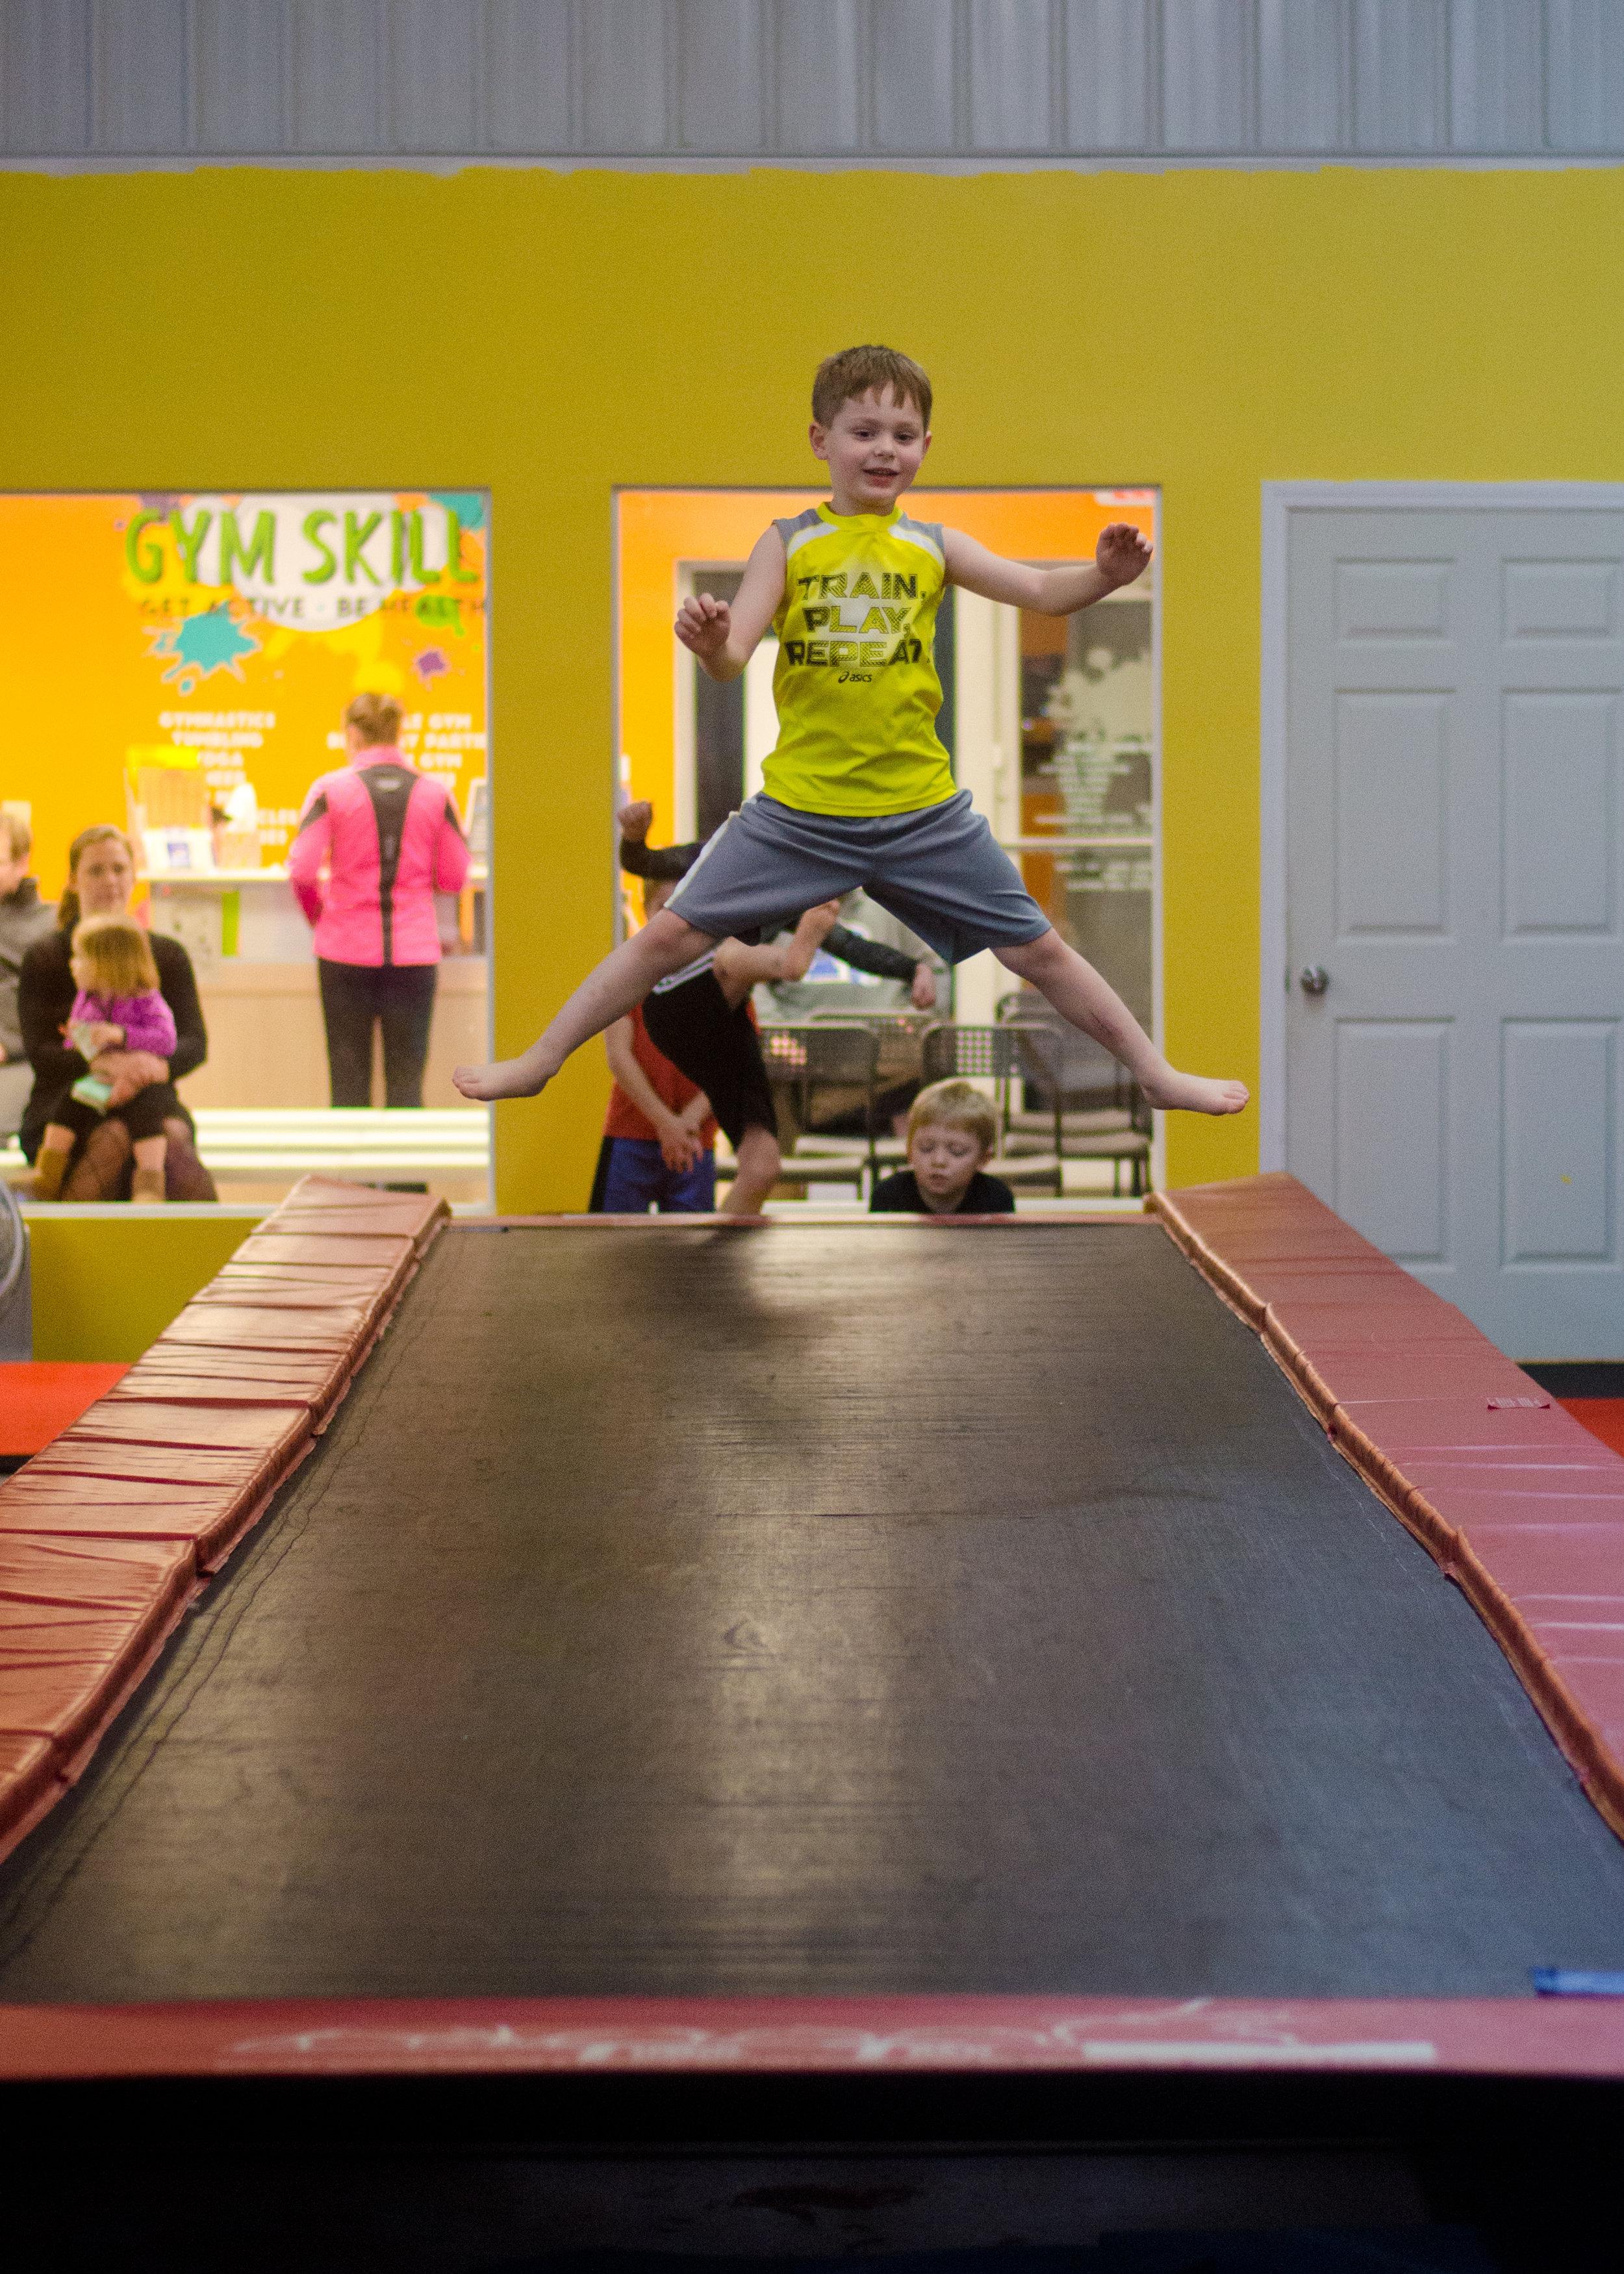 Bounce on our Tumble Trak!